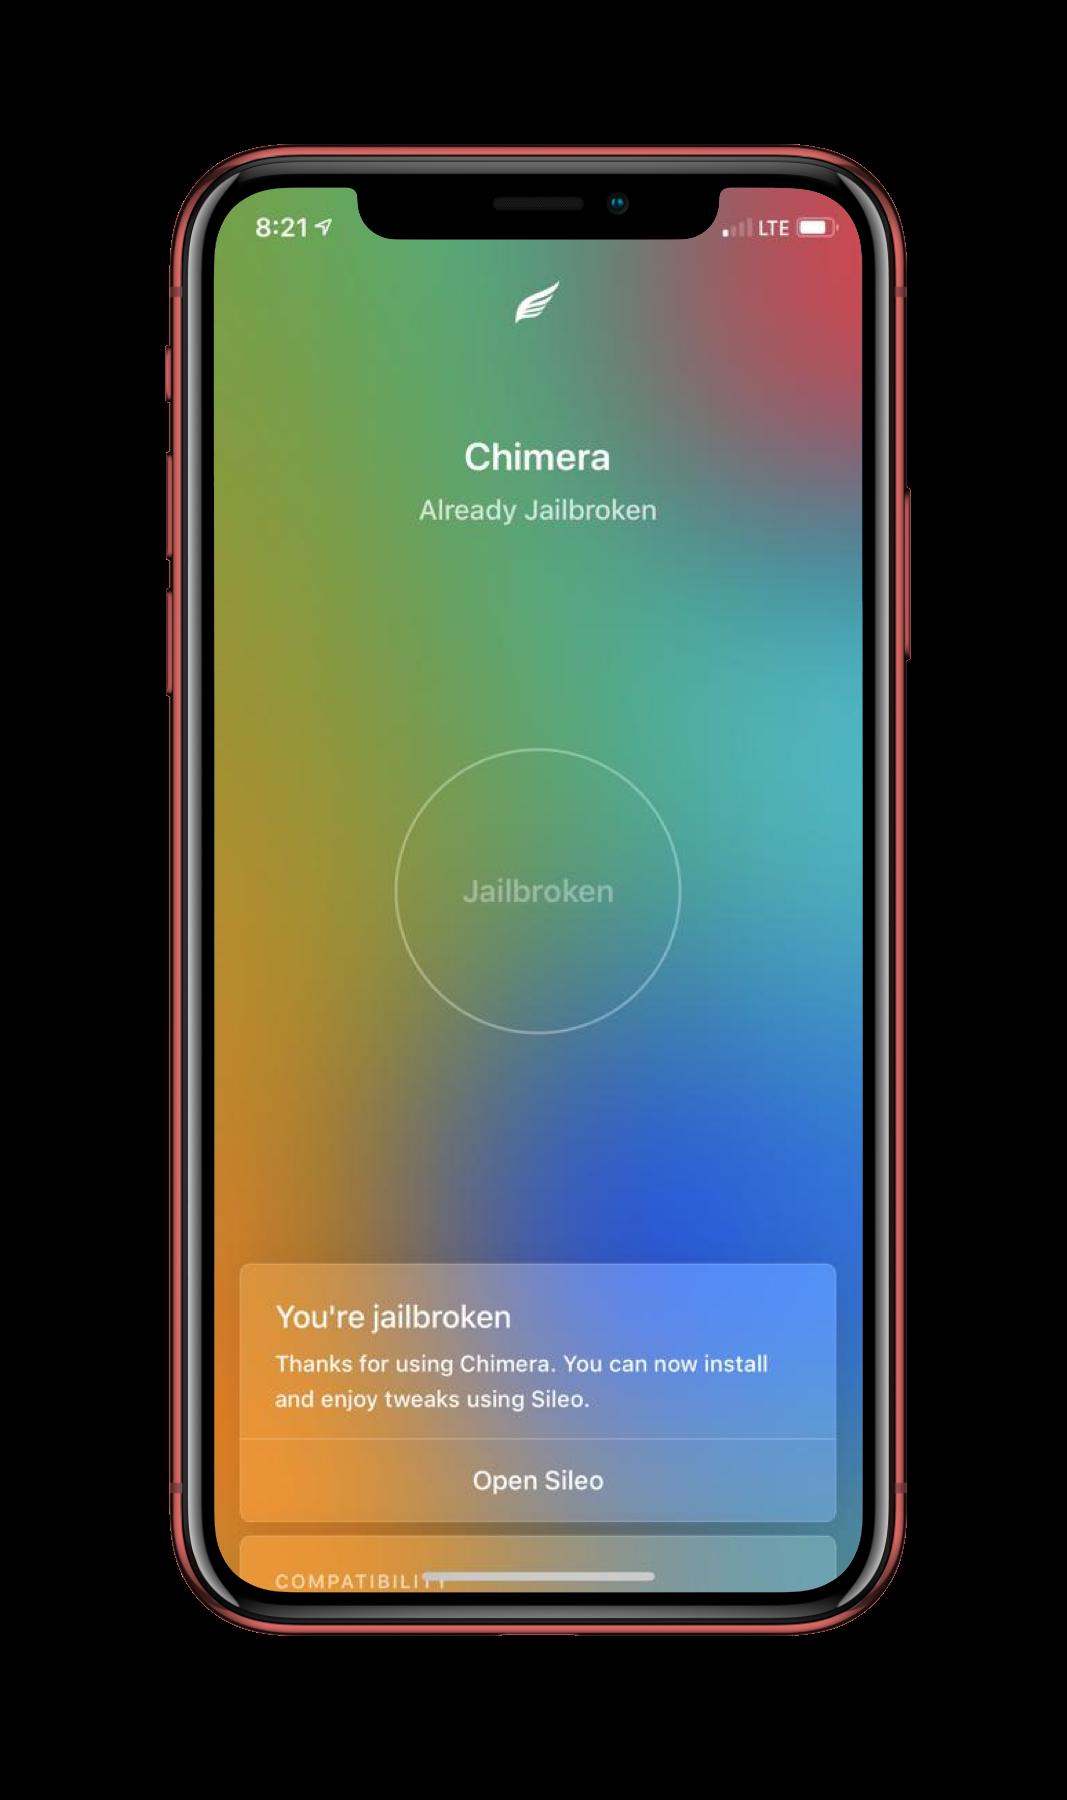 Chimera 1 0 2 IPA Download Of iOS 12 1 2 Jailbreak For